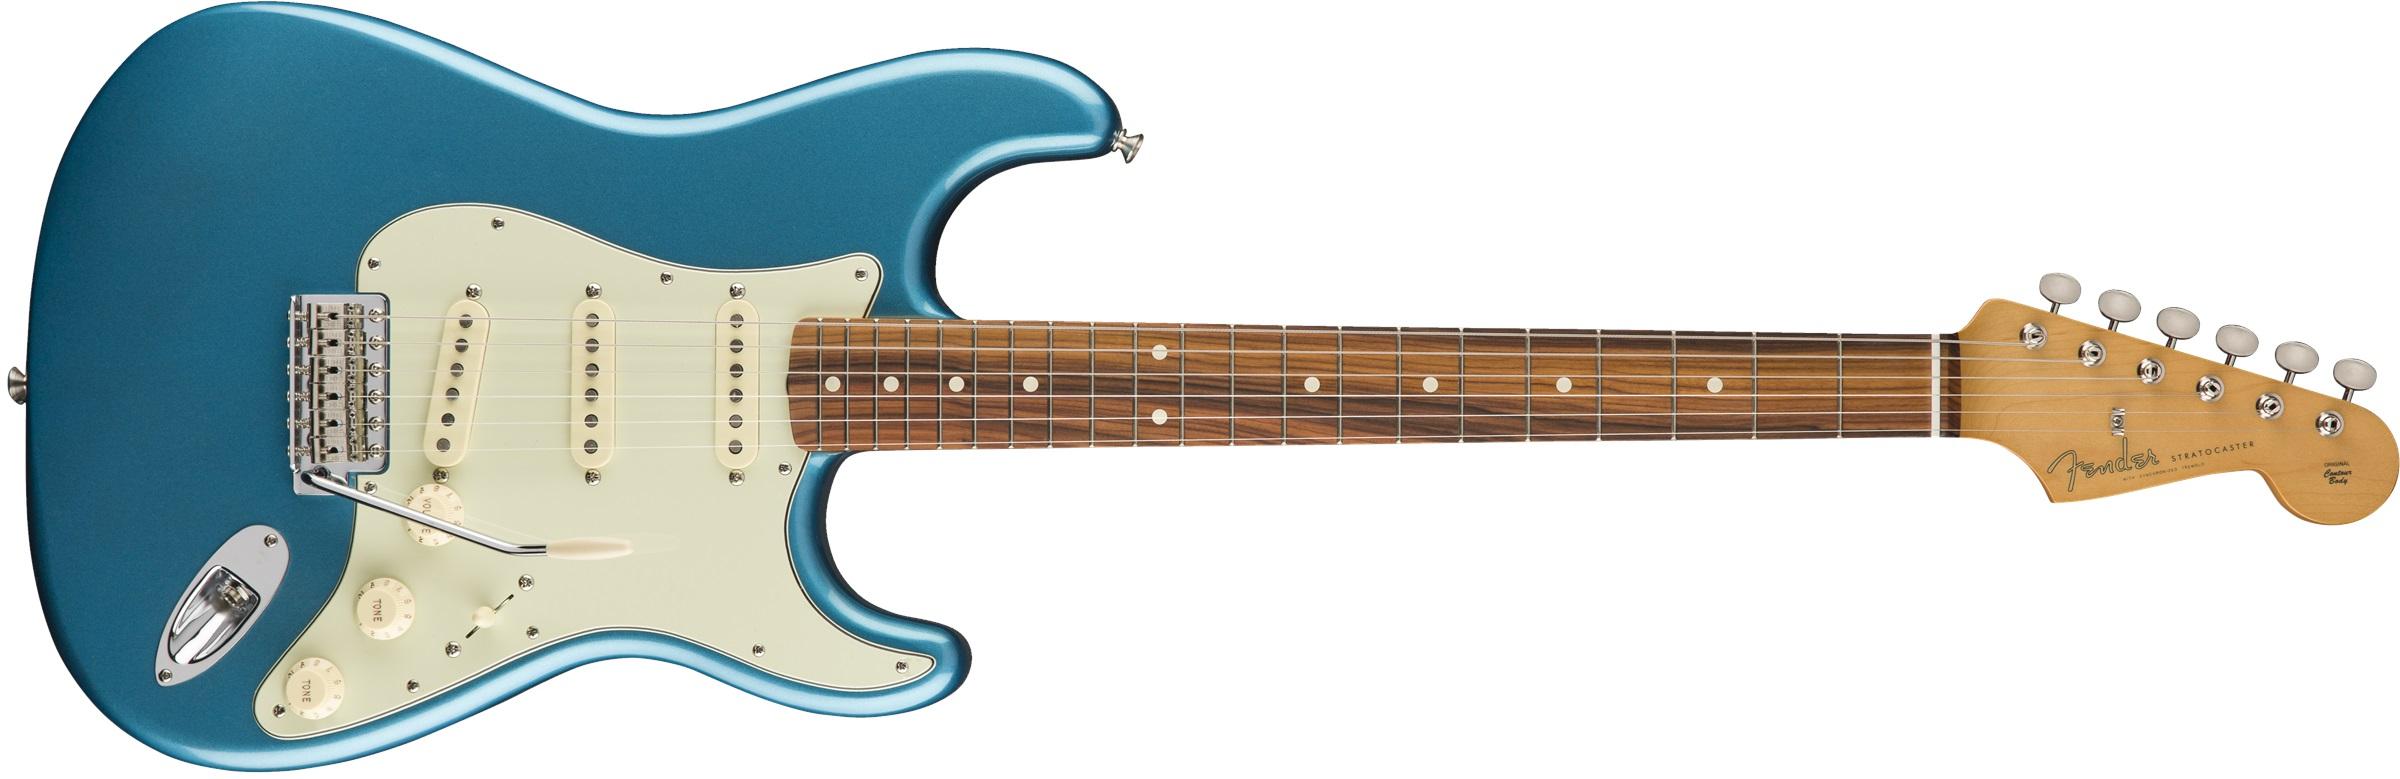 Fender 60s Stratocaster PF PF LPB